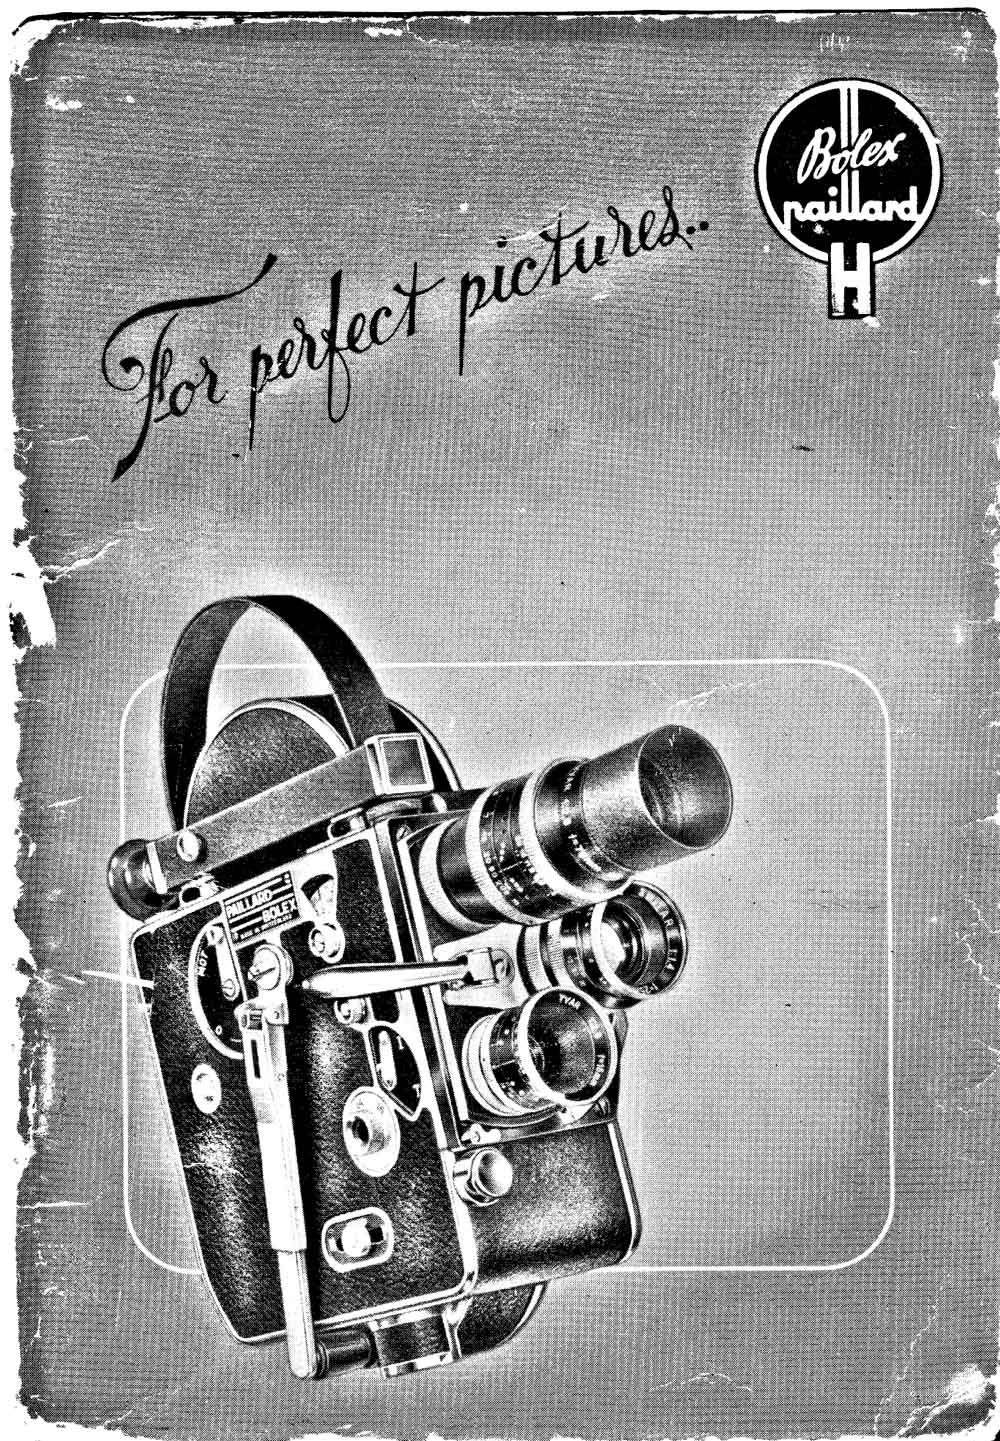 PAILLARD-BOLEX Model H Cameras user manual cover